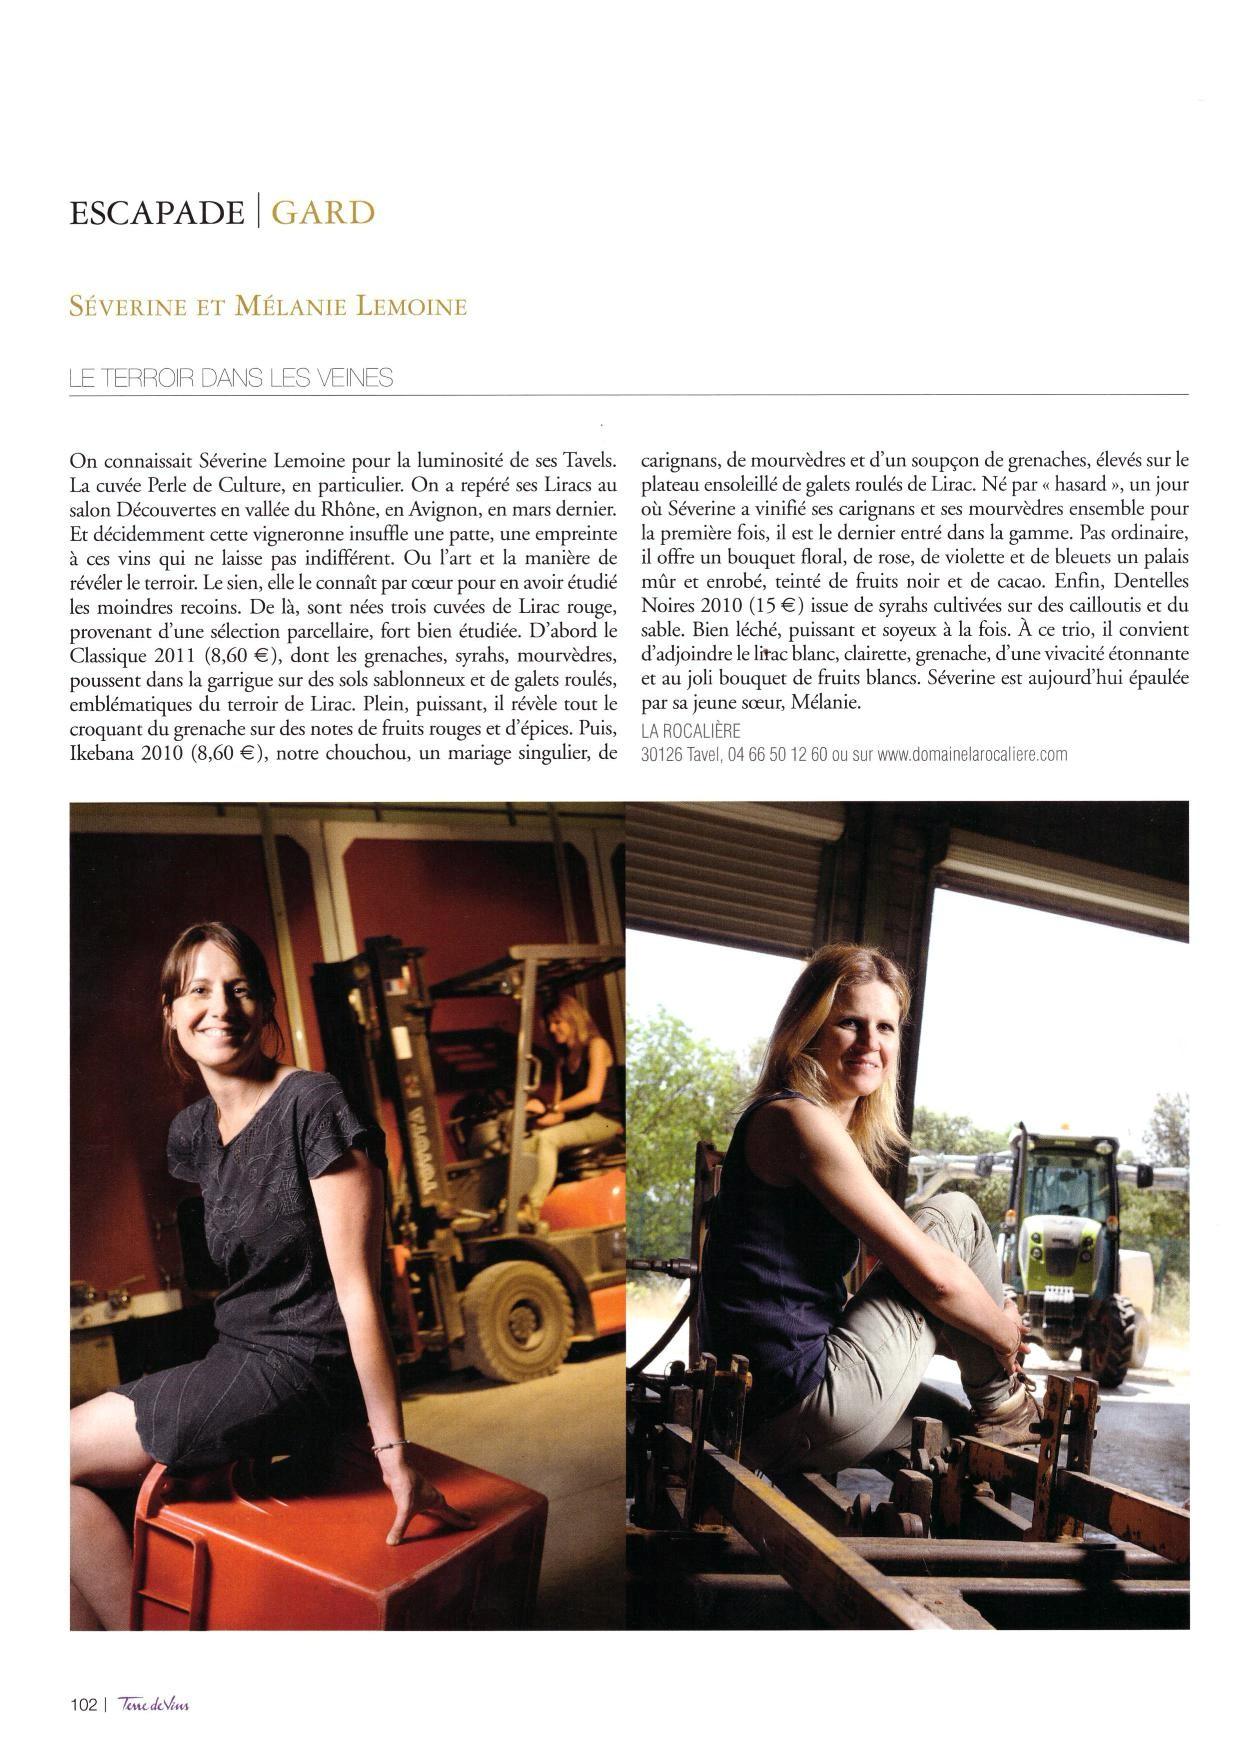 terre de vins 2013 presse